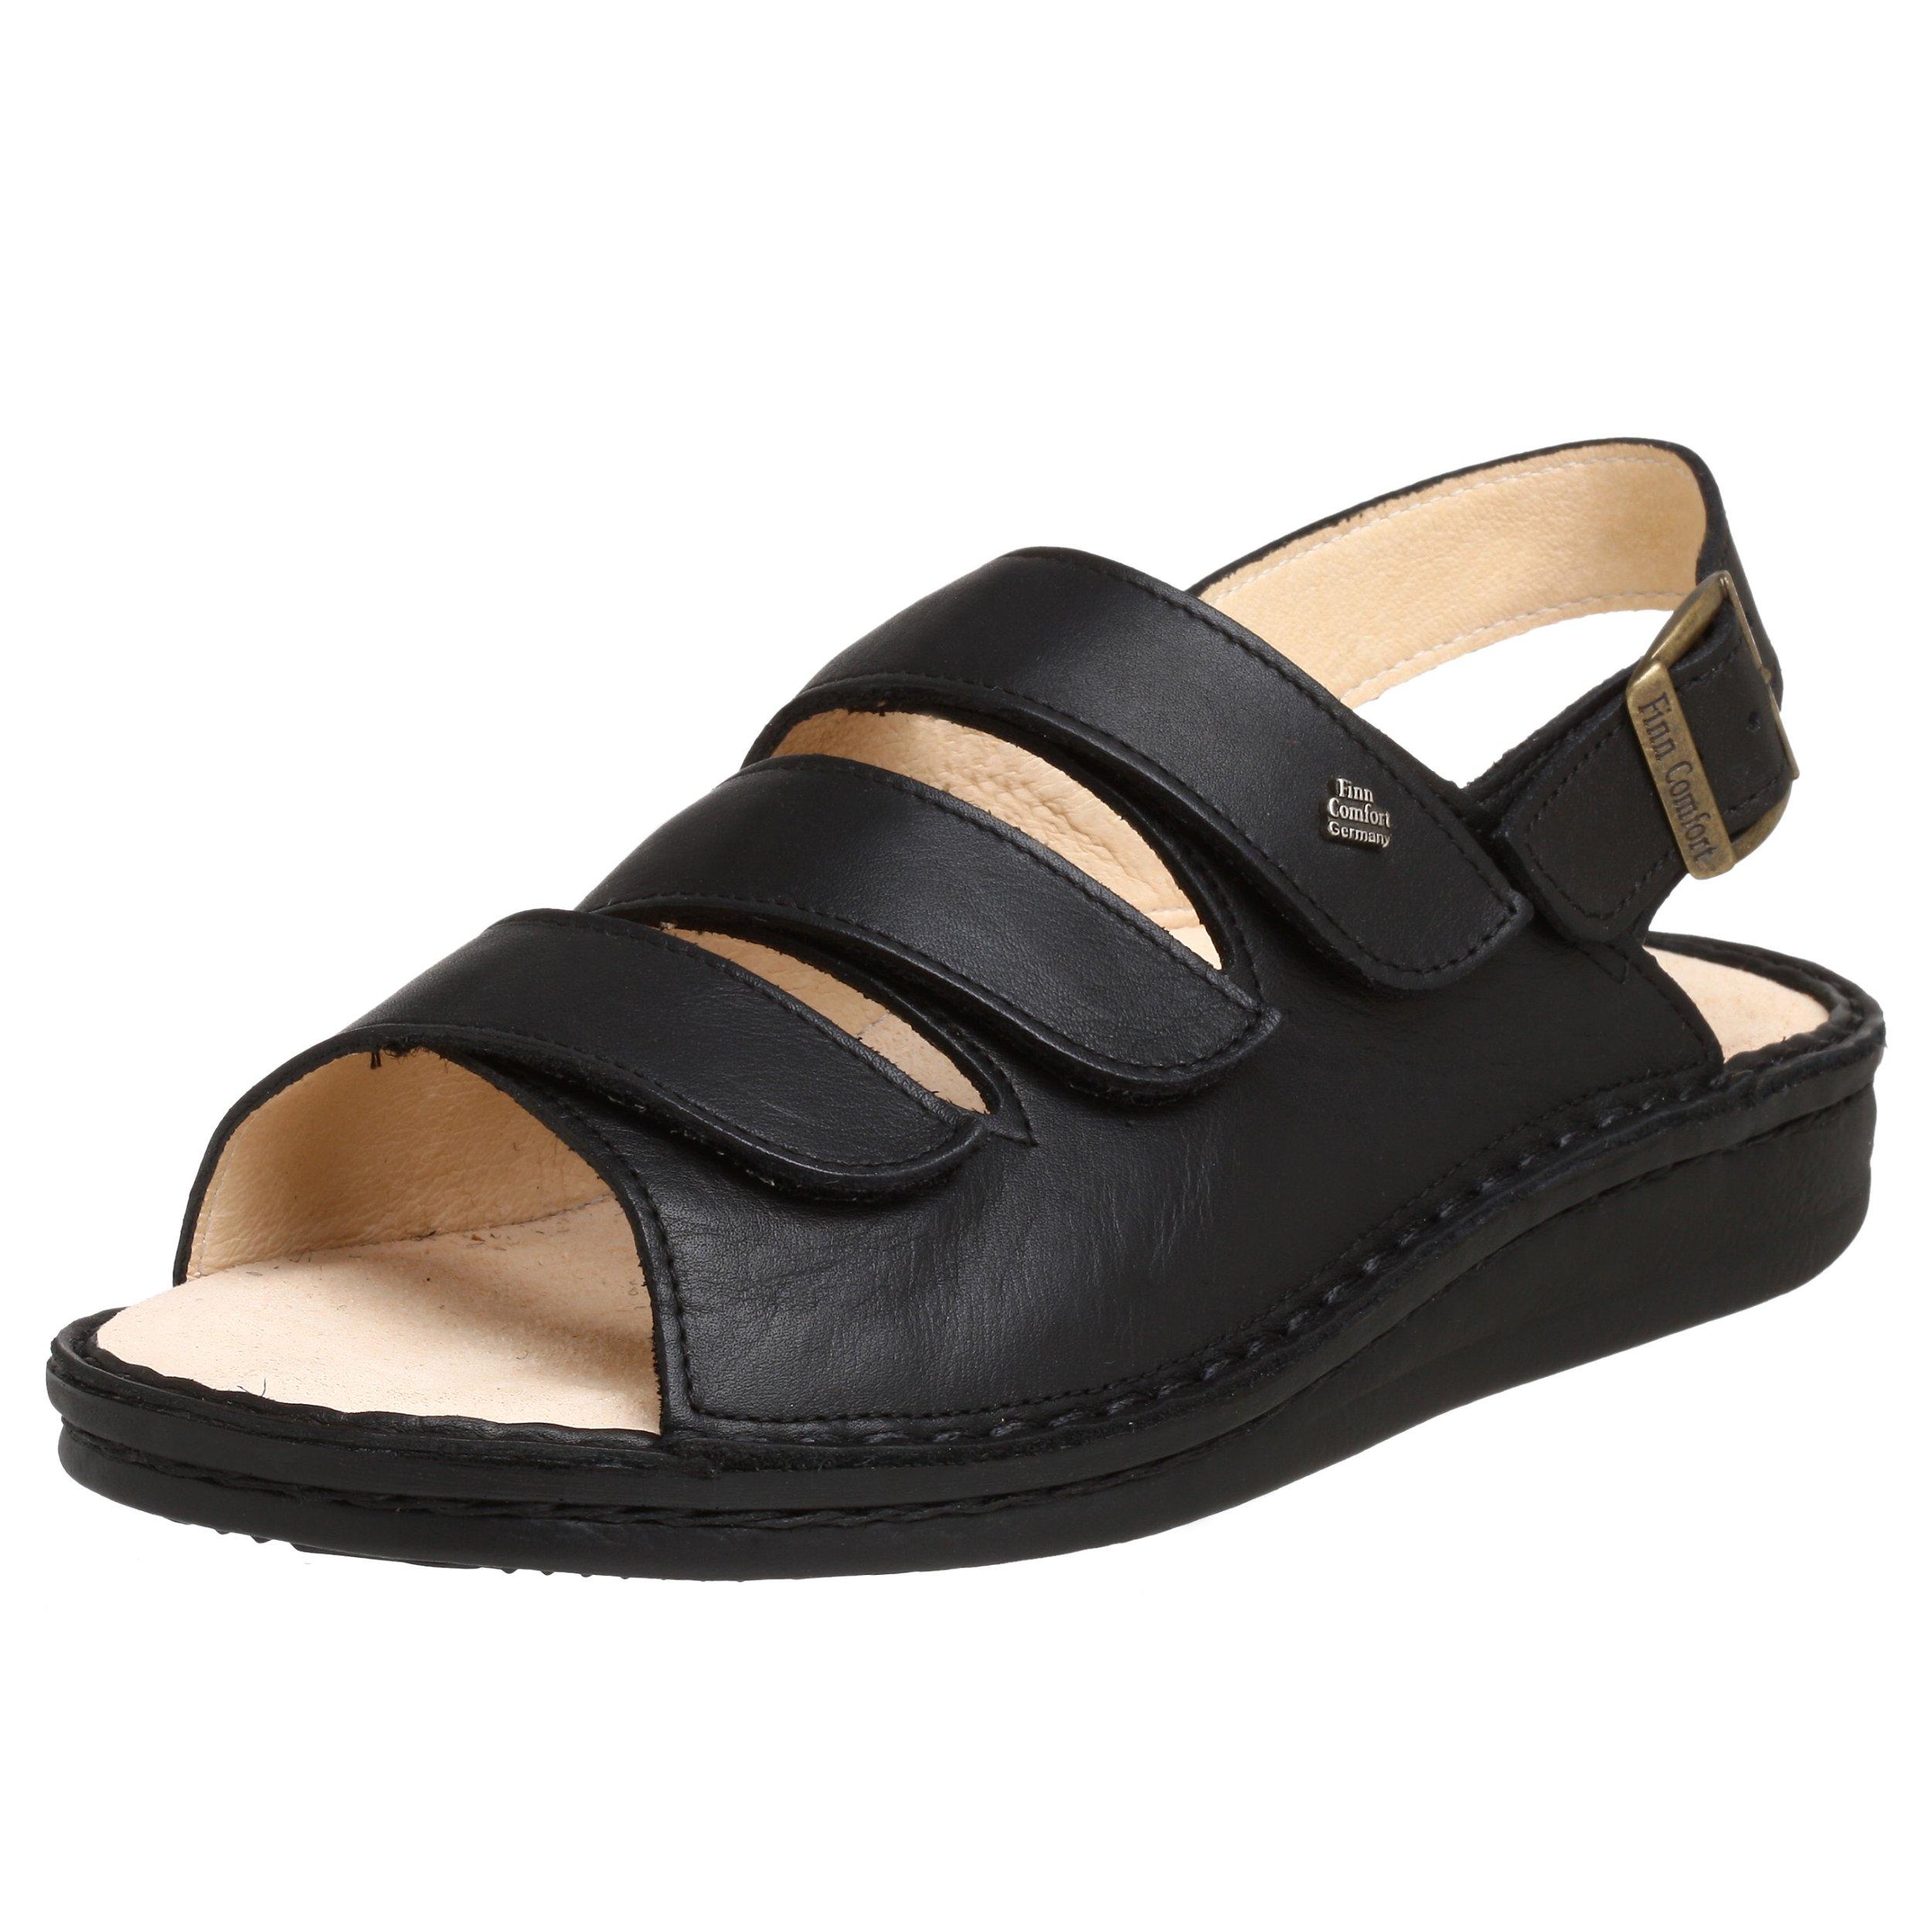 Finn Comfort Women's Sylt Sandal,Black Nappa,41 EU (US Women's 10 M)